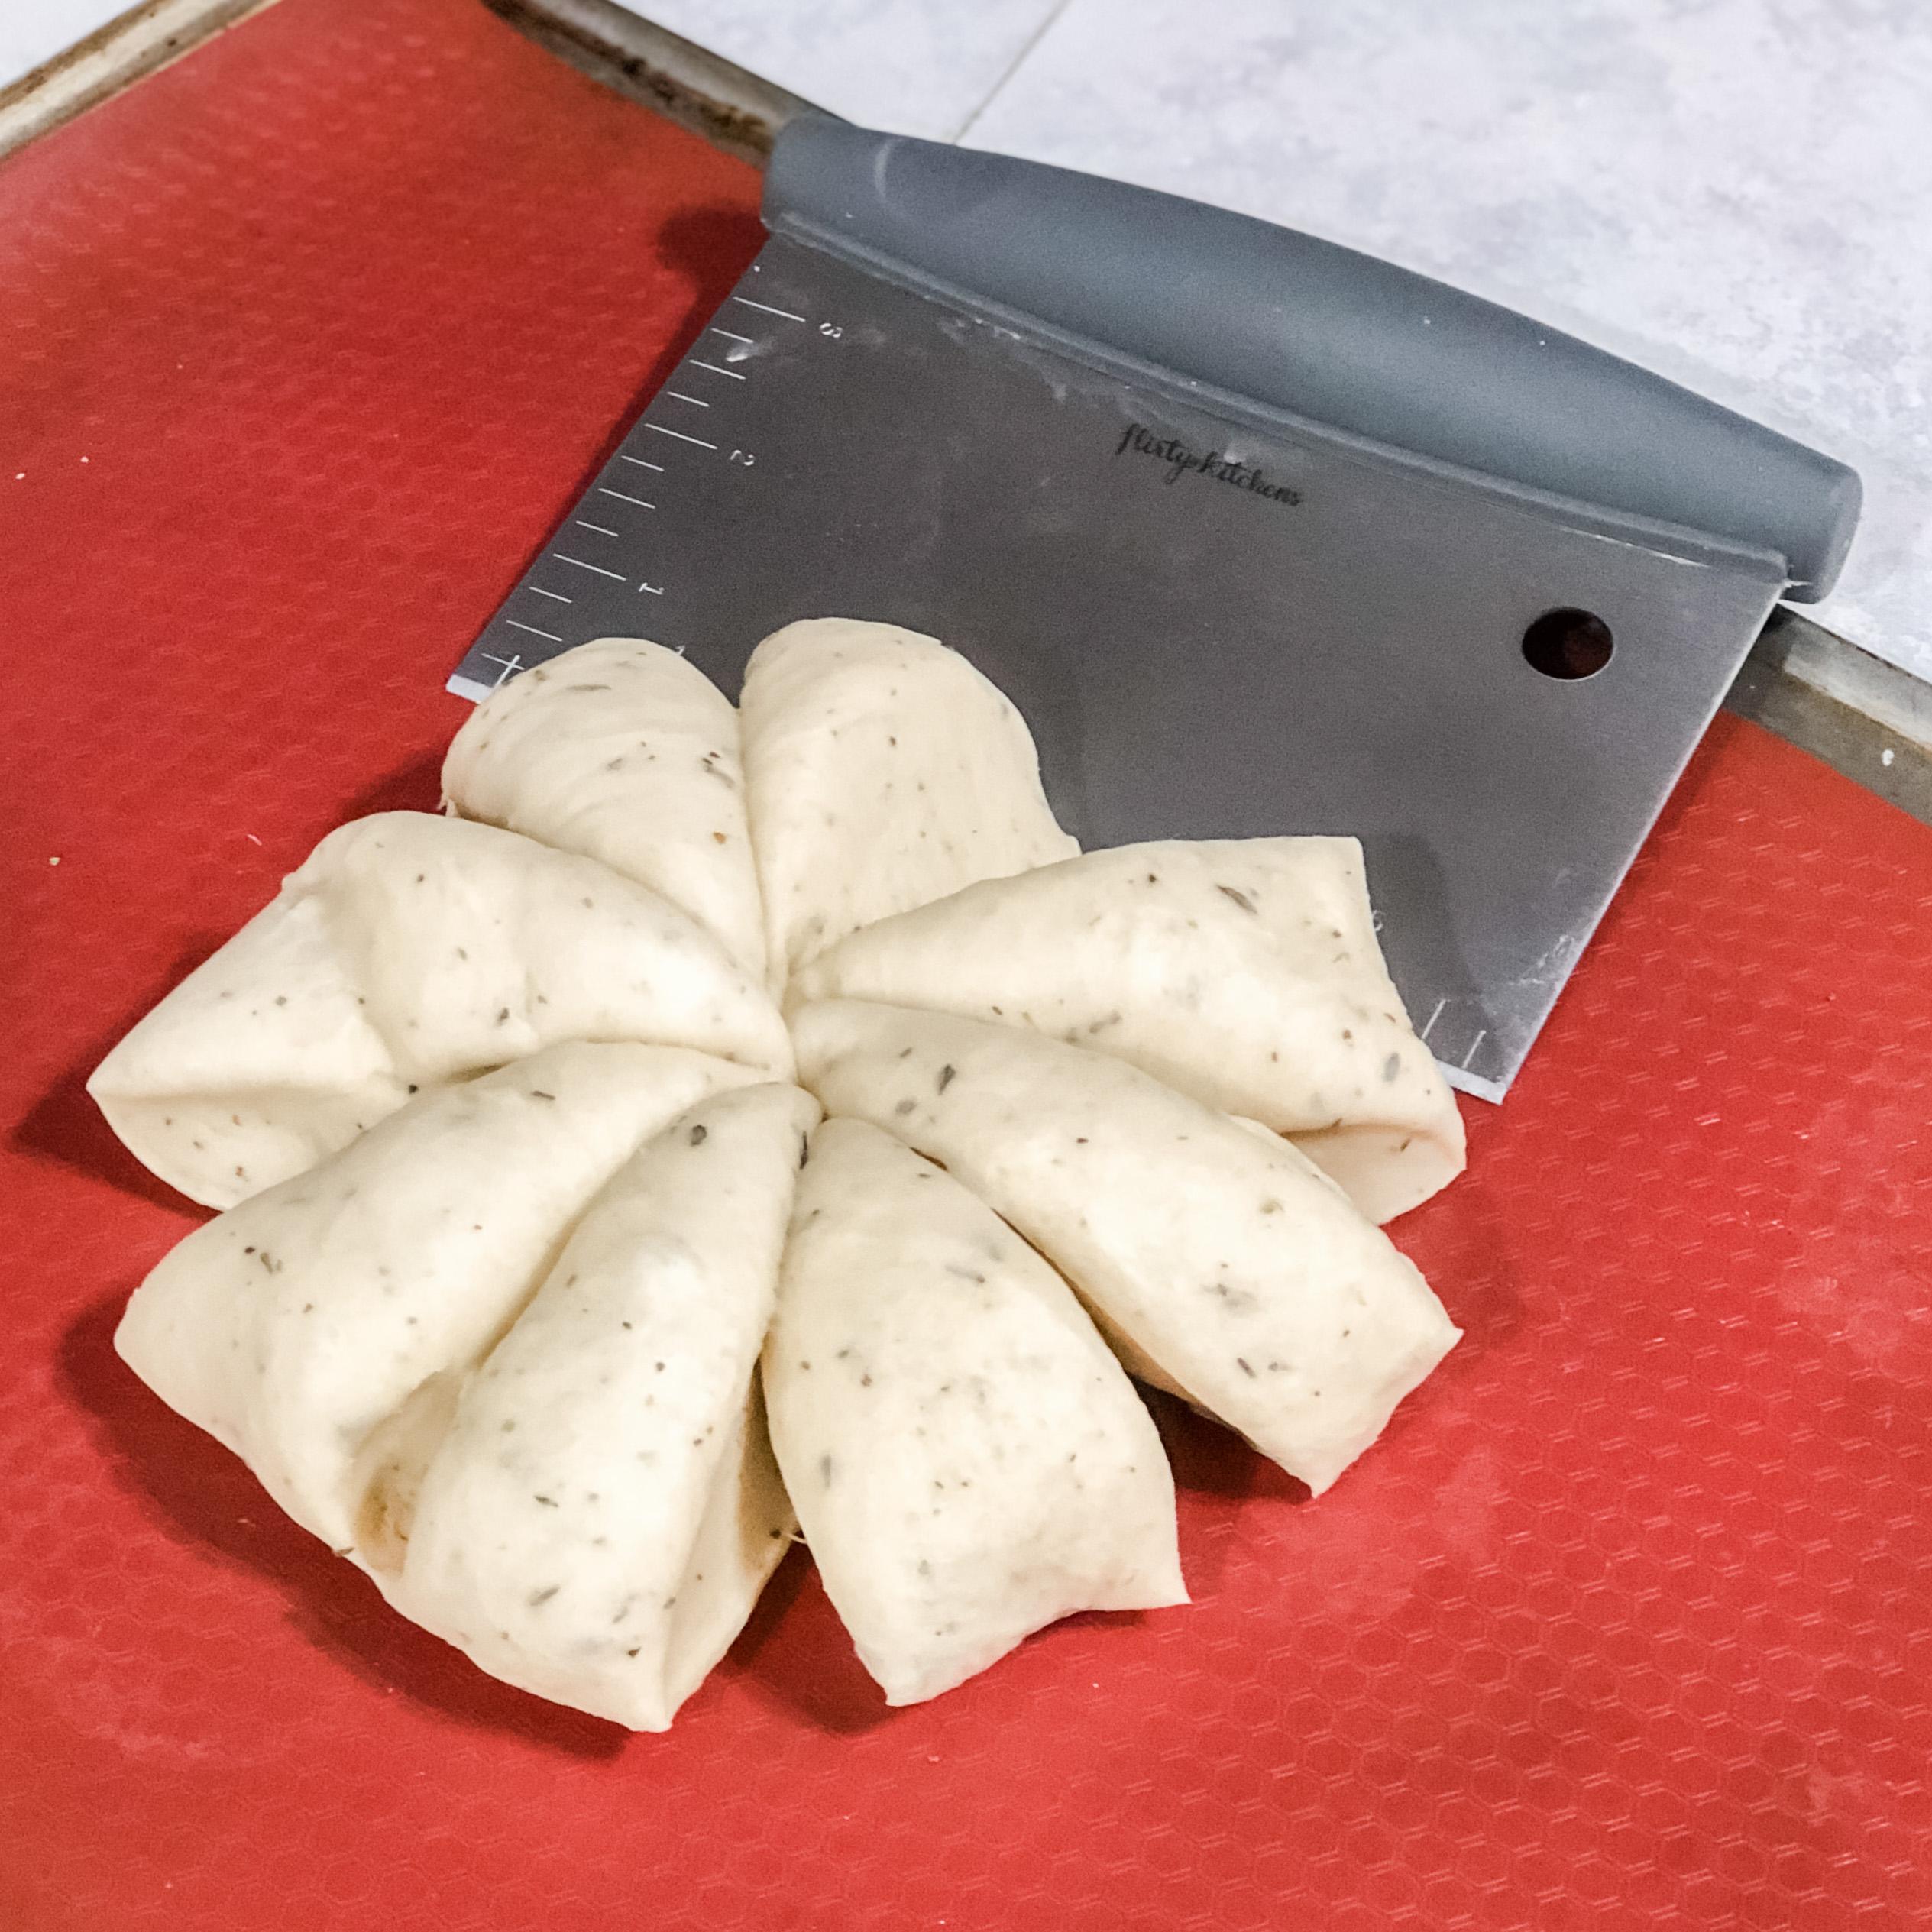 Dividing the dough with a dough cutter